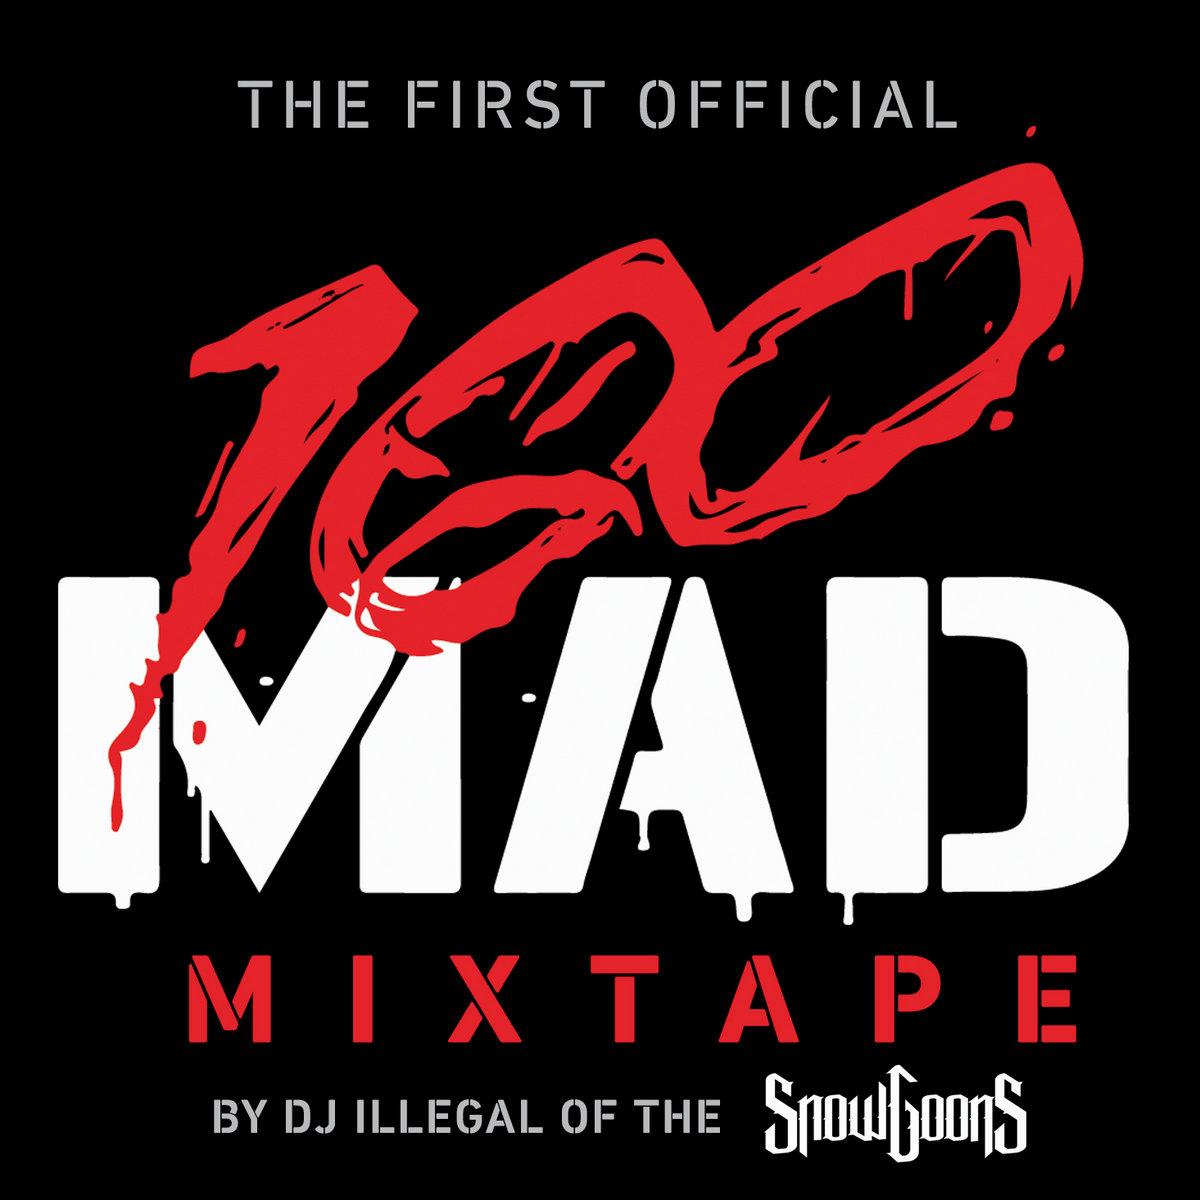 VA - 100 MAD Mixtape Volume One (2020) [FLAC] Download